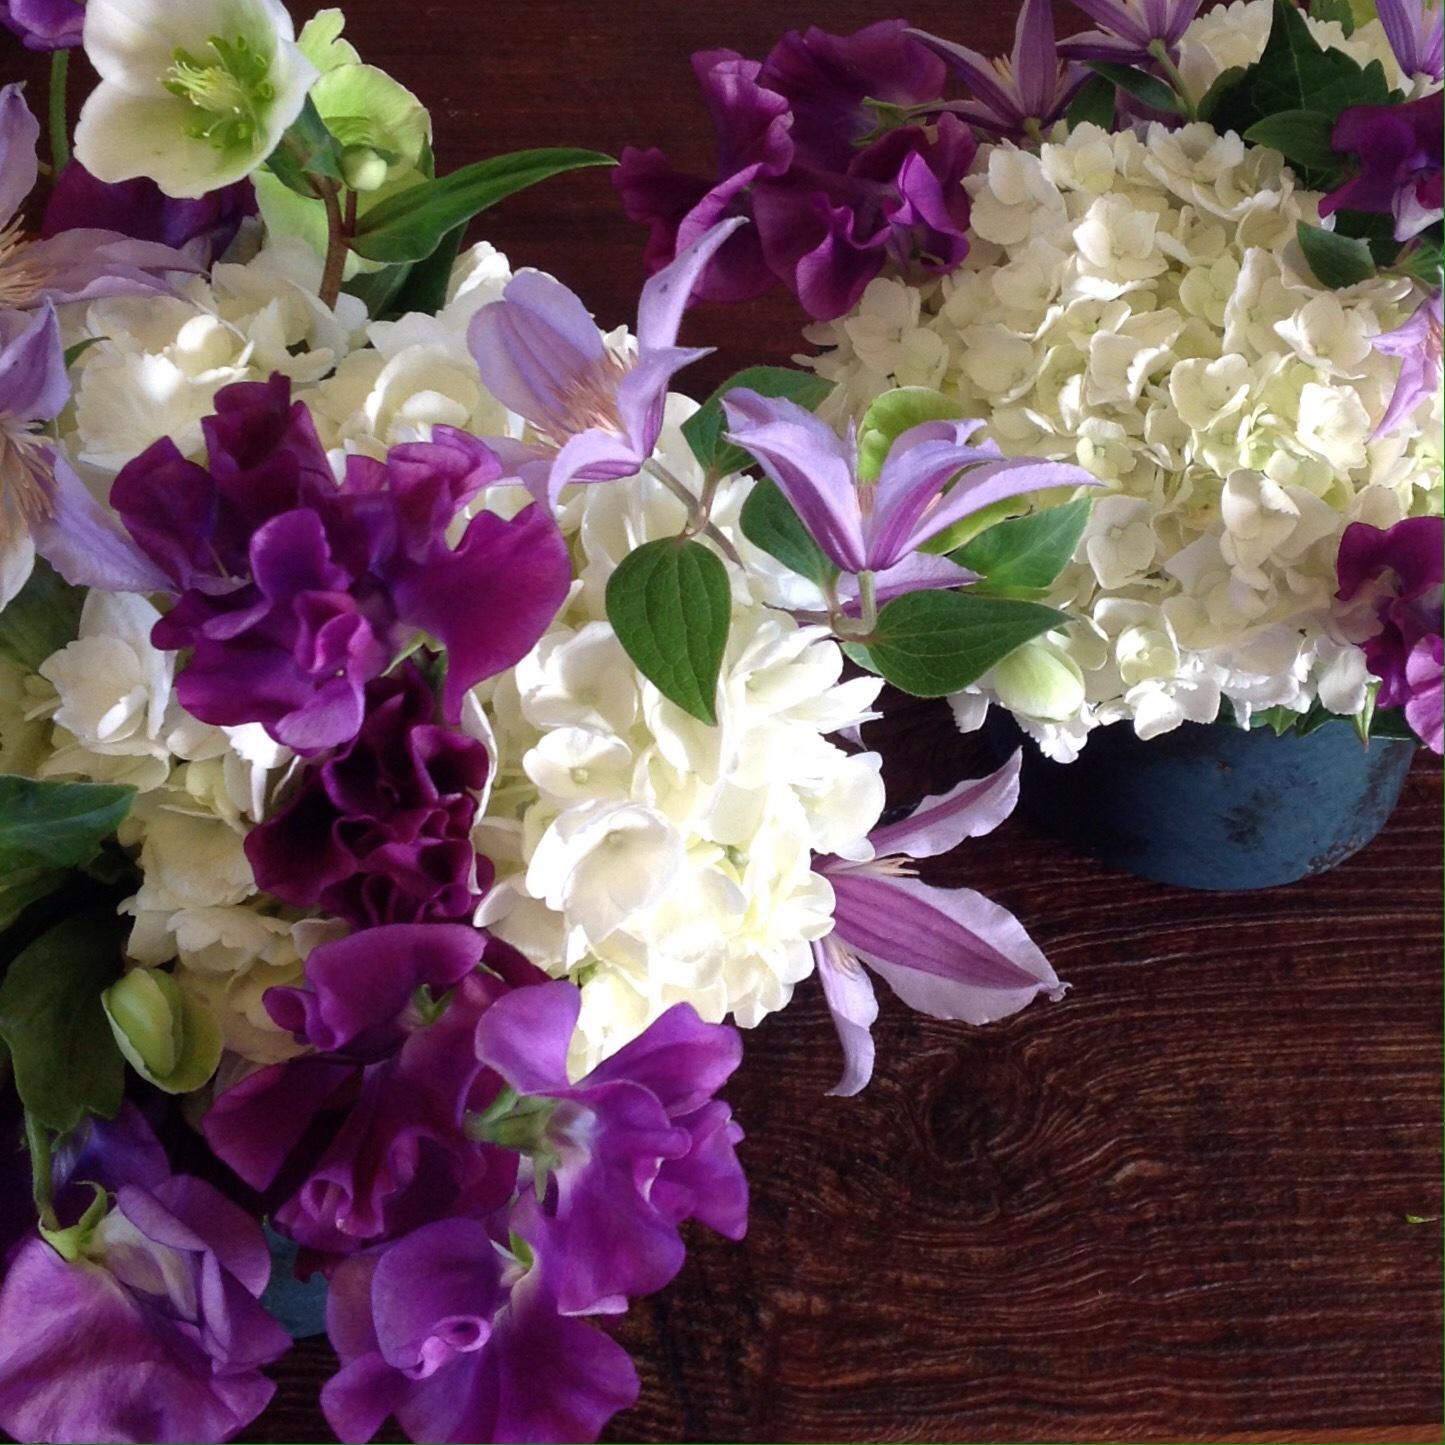 Fragrant Purple Sweet Pea Posies starting at $100